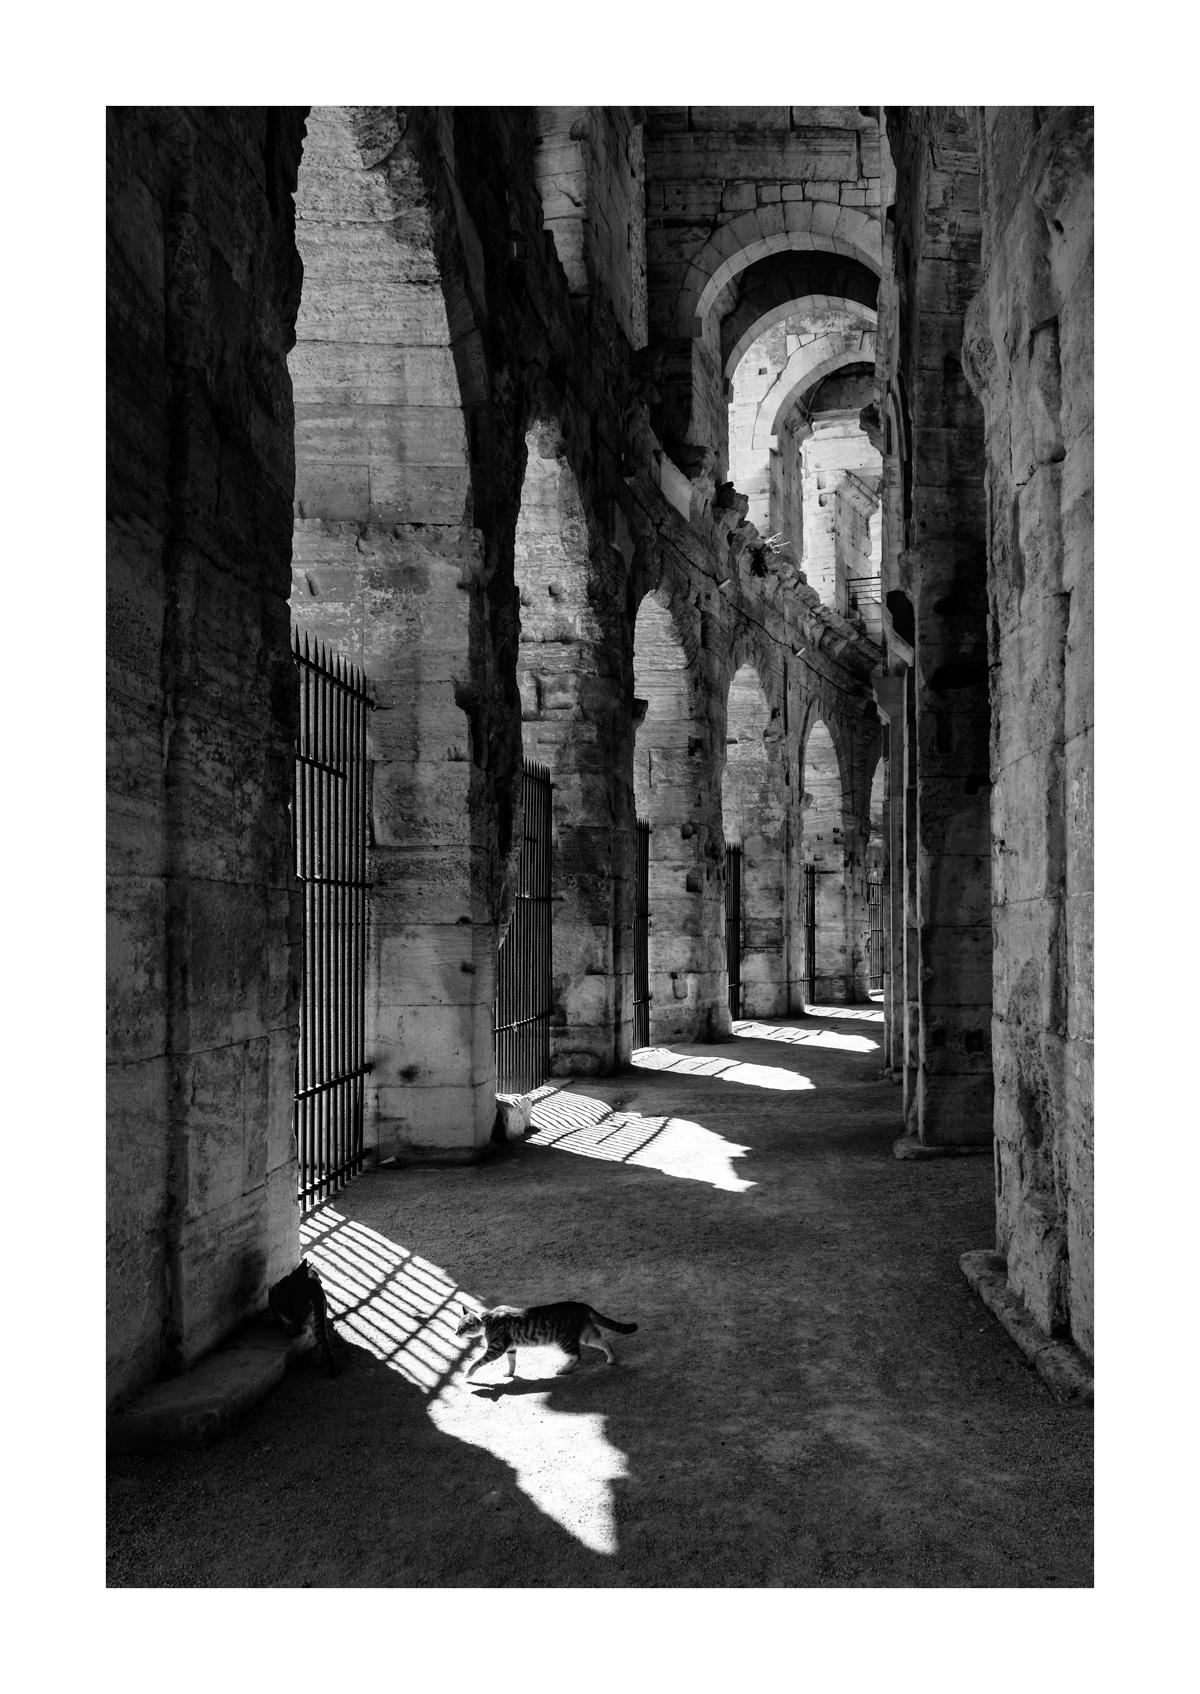 Les arènes - Arles.